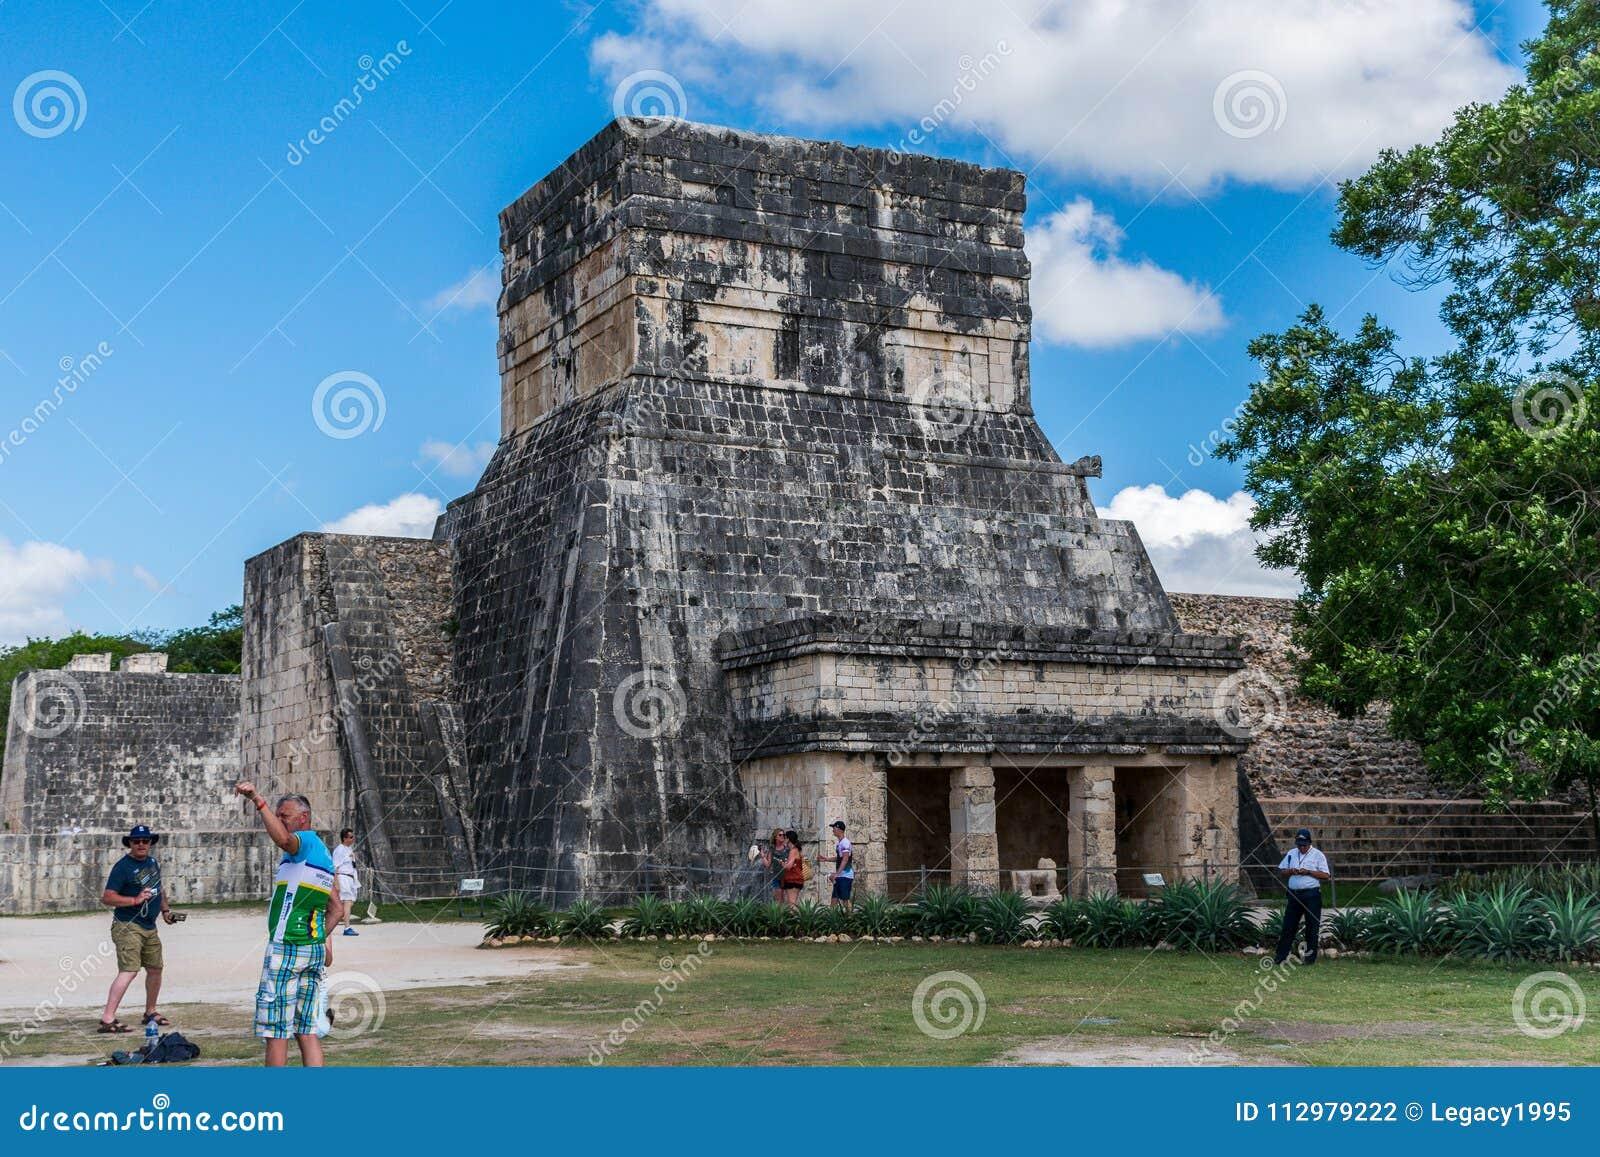 Temple of the Jaguars in Chichen Itza, Mexico